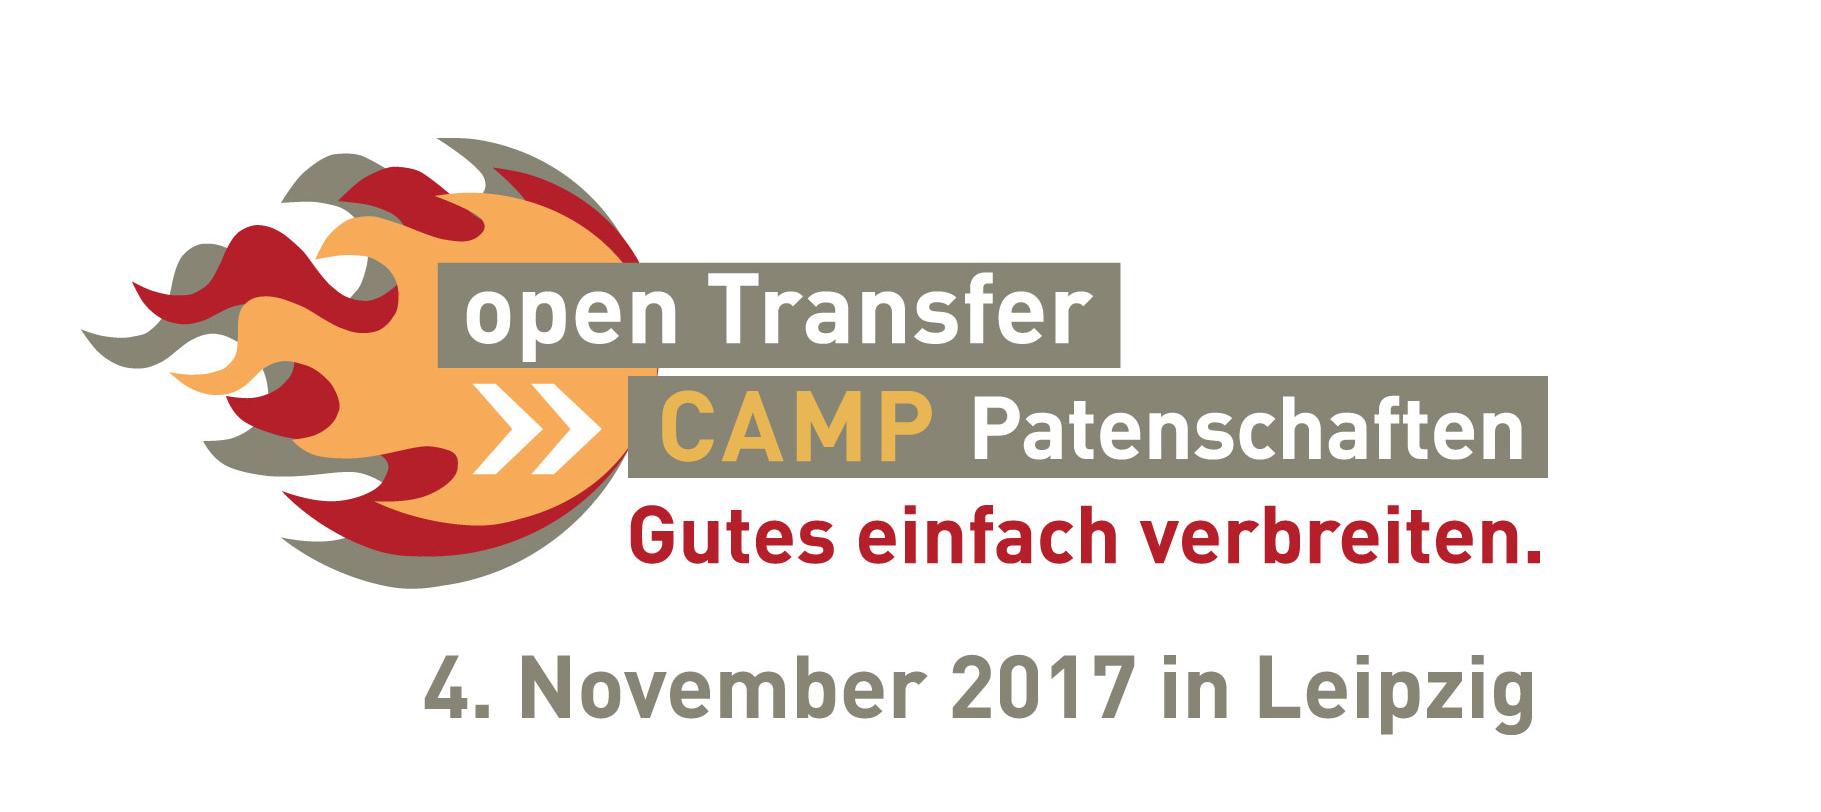 Jetzt Anmelden zum openTransfer CAMP #Patenschaften